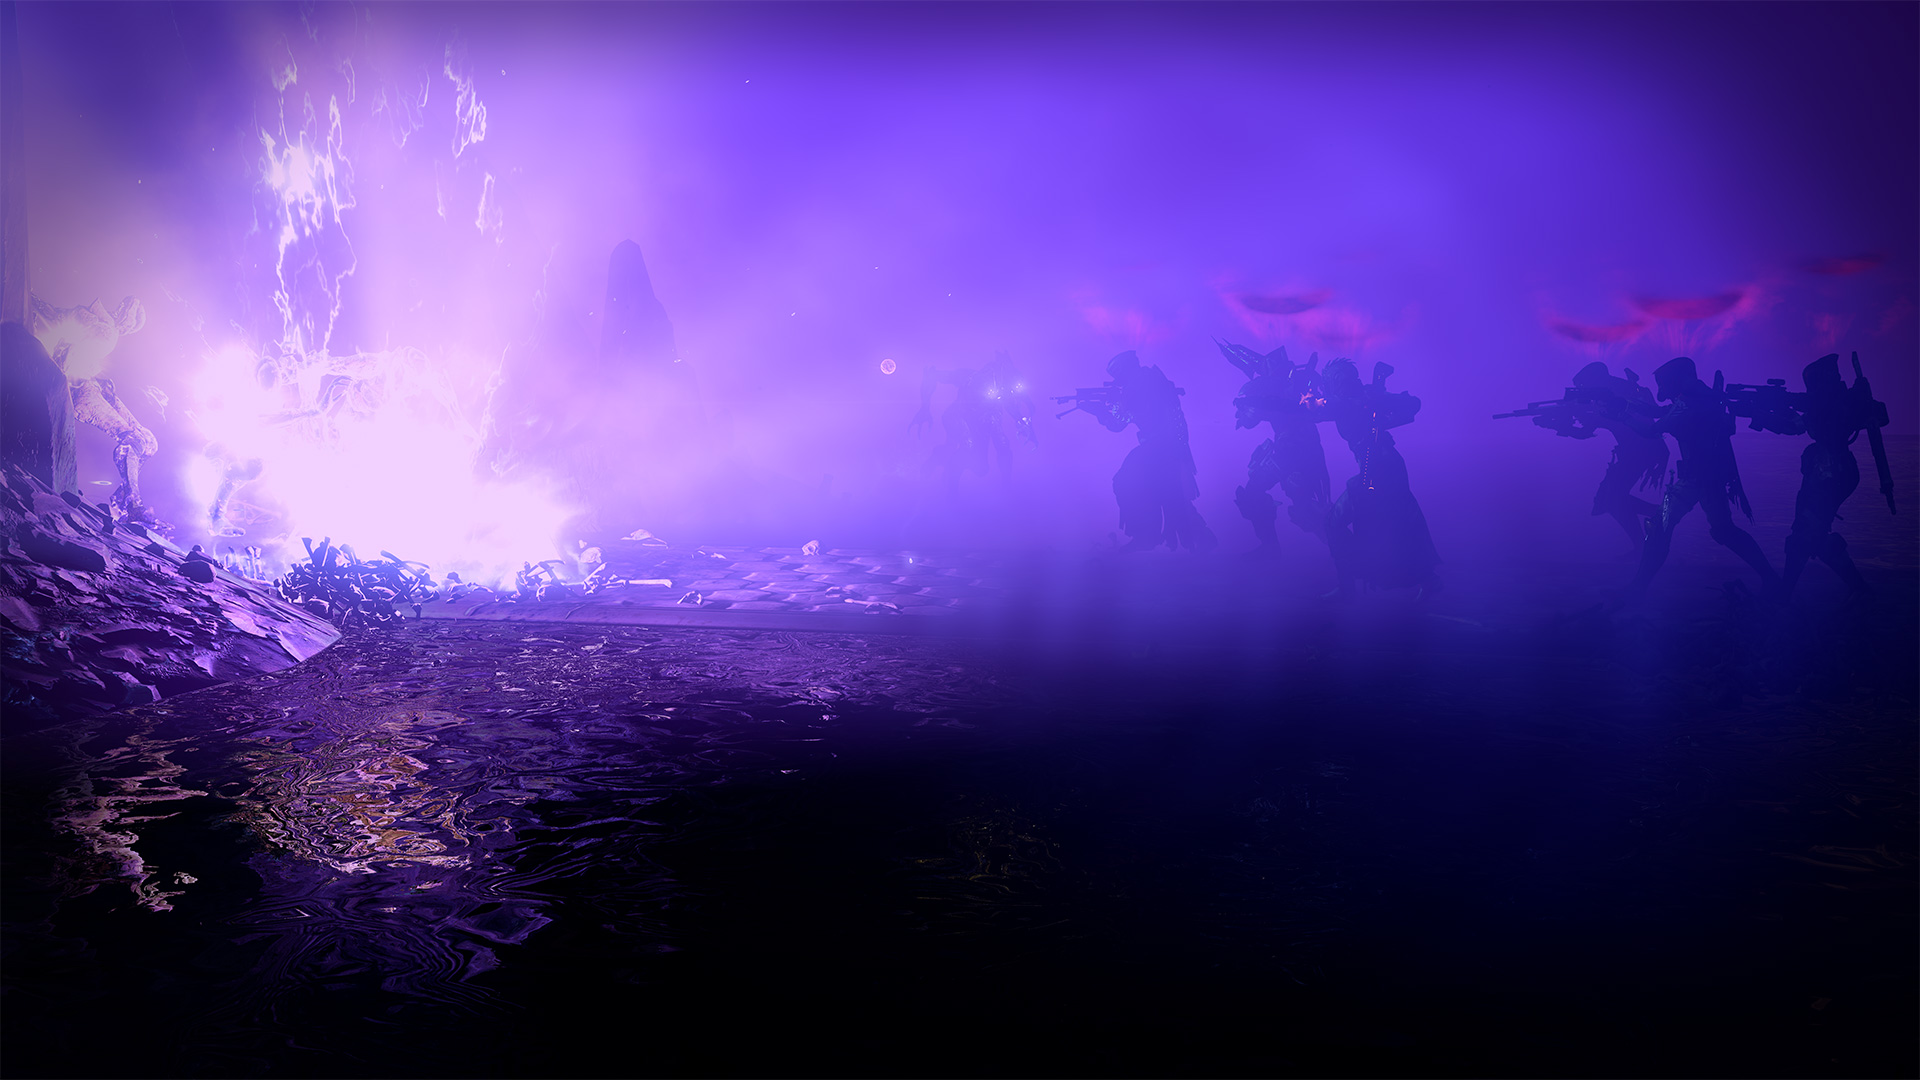 Destiny's new raid, Crota's End, has already been beaten